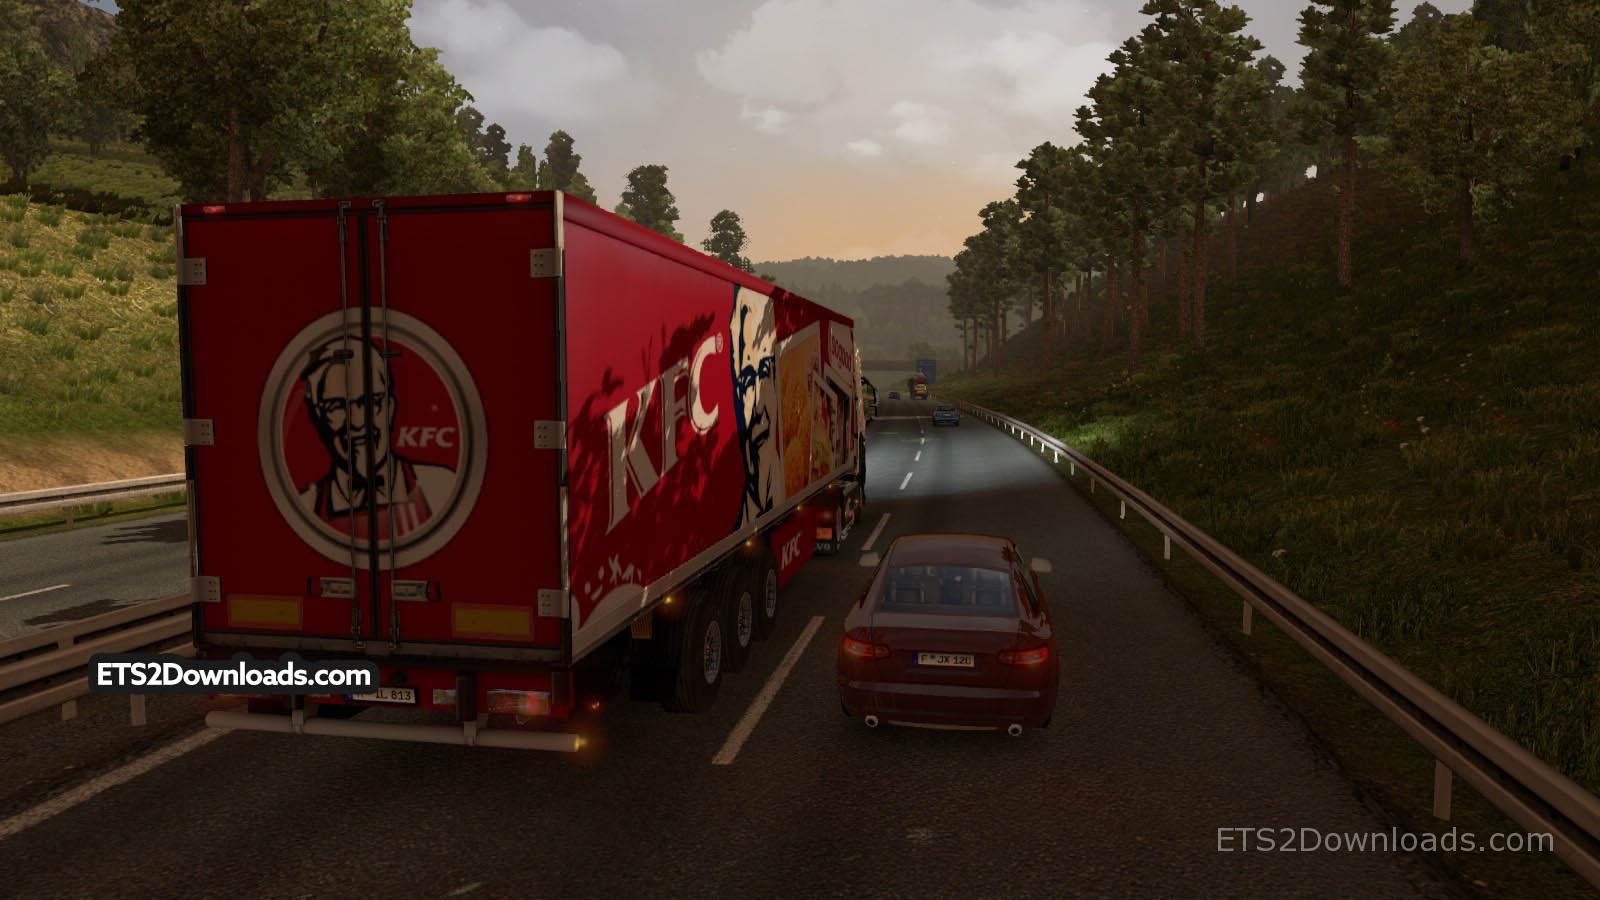 kfc-trailer-v2-ets2-2